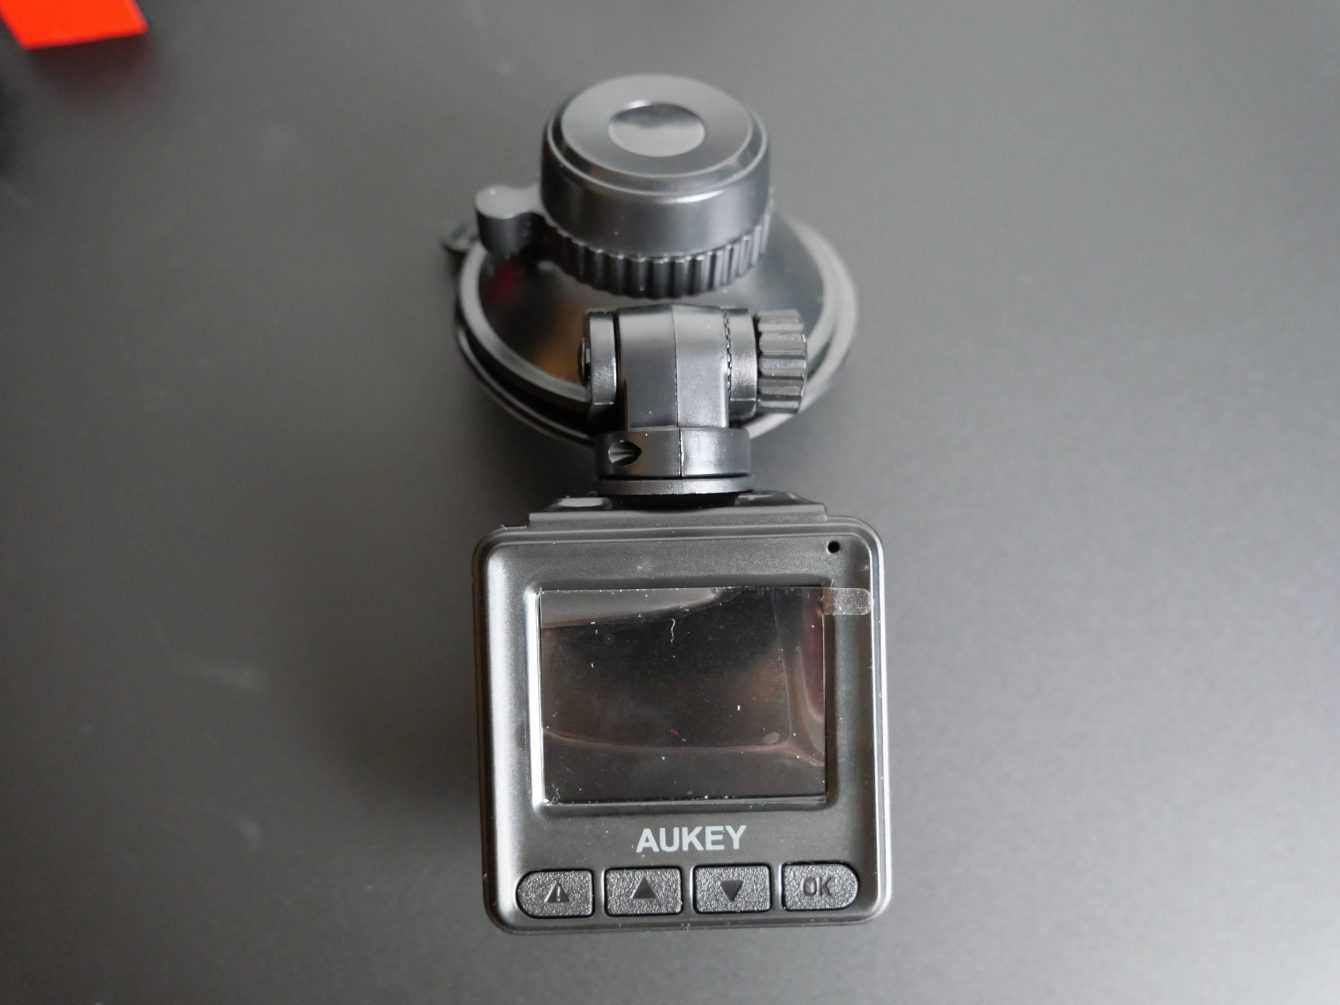 Recensione Aukey dashcam DRA5: un valido aiuto?